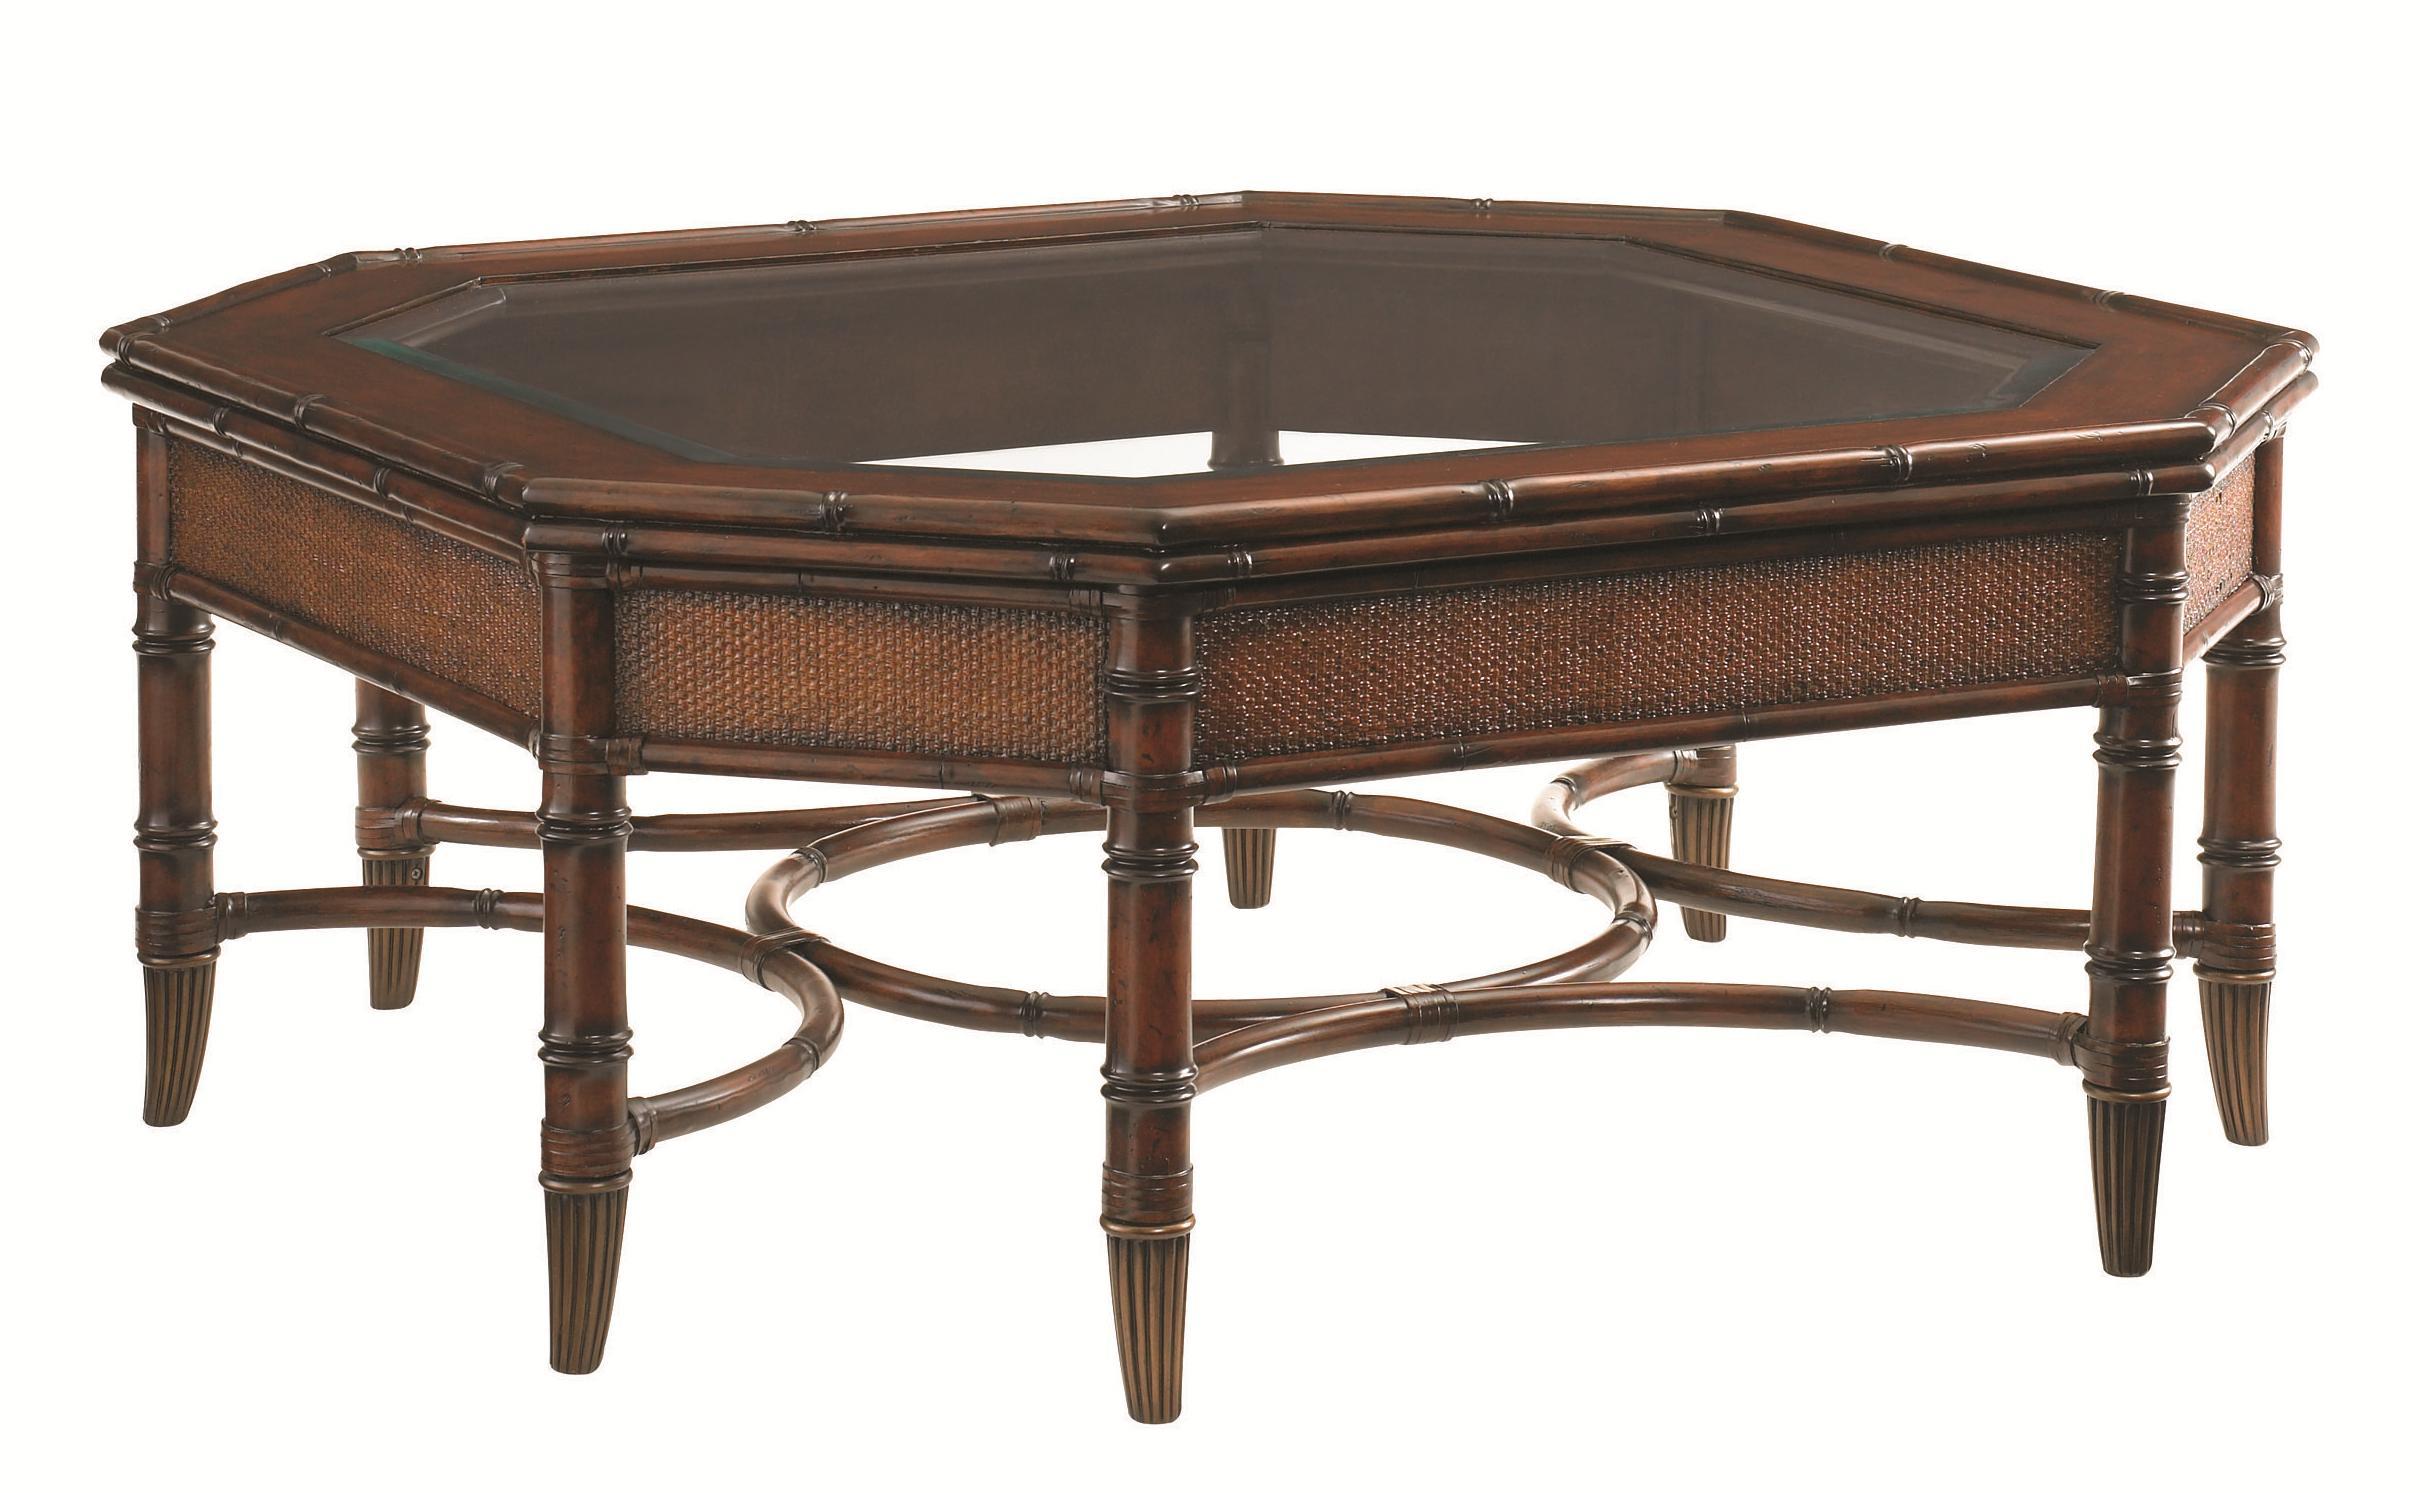 enchanting tommy bahama coffee table design. Black Bedroom Furniture Sets. Home Design Ideas